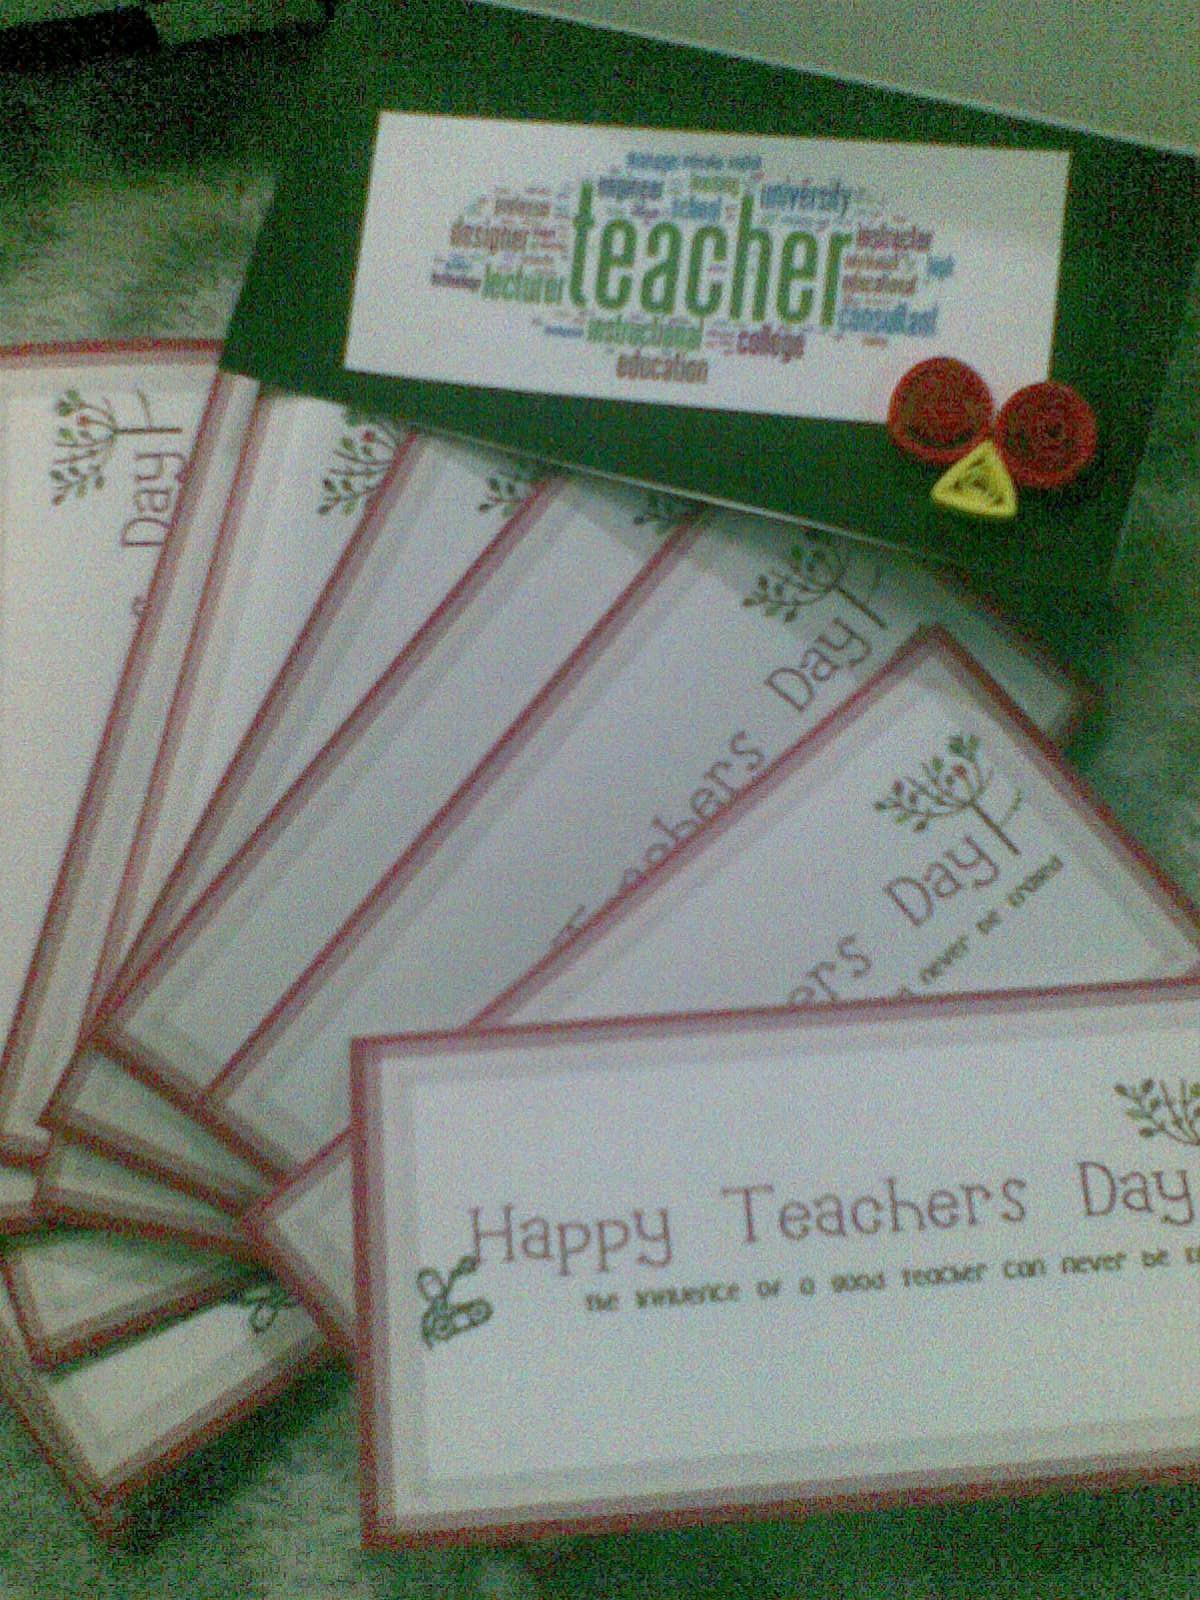 Mardhiah's Craft: Teacher's Day Cards